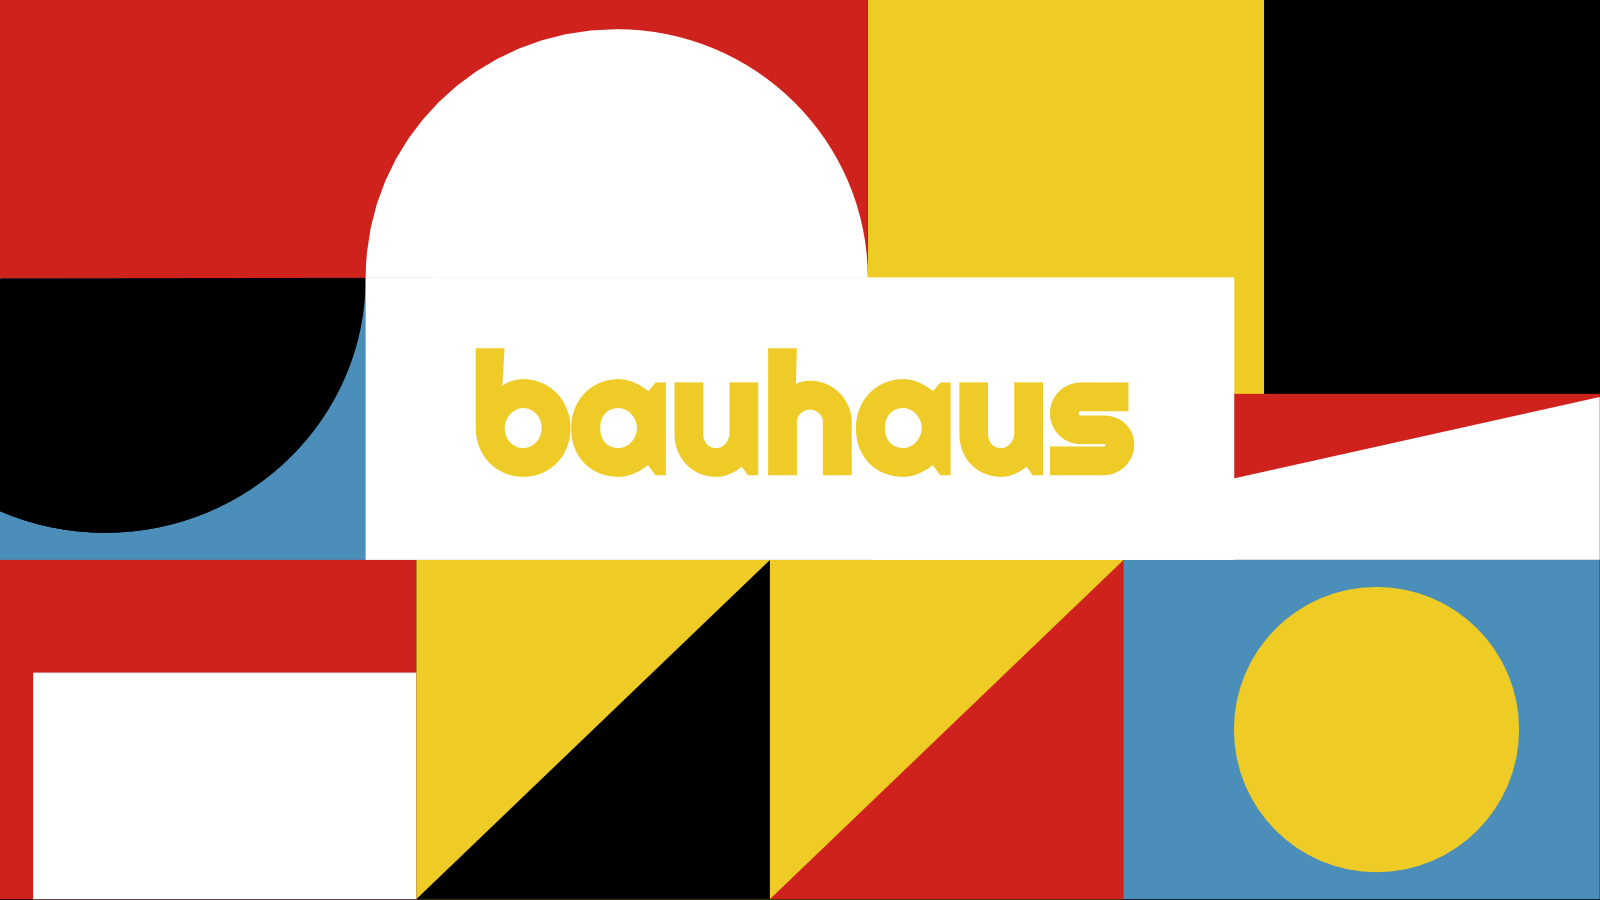 Bauhaus presentation template